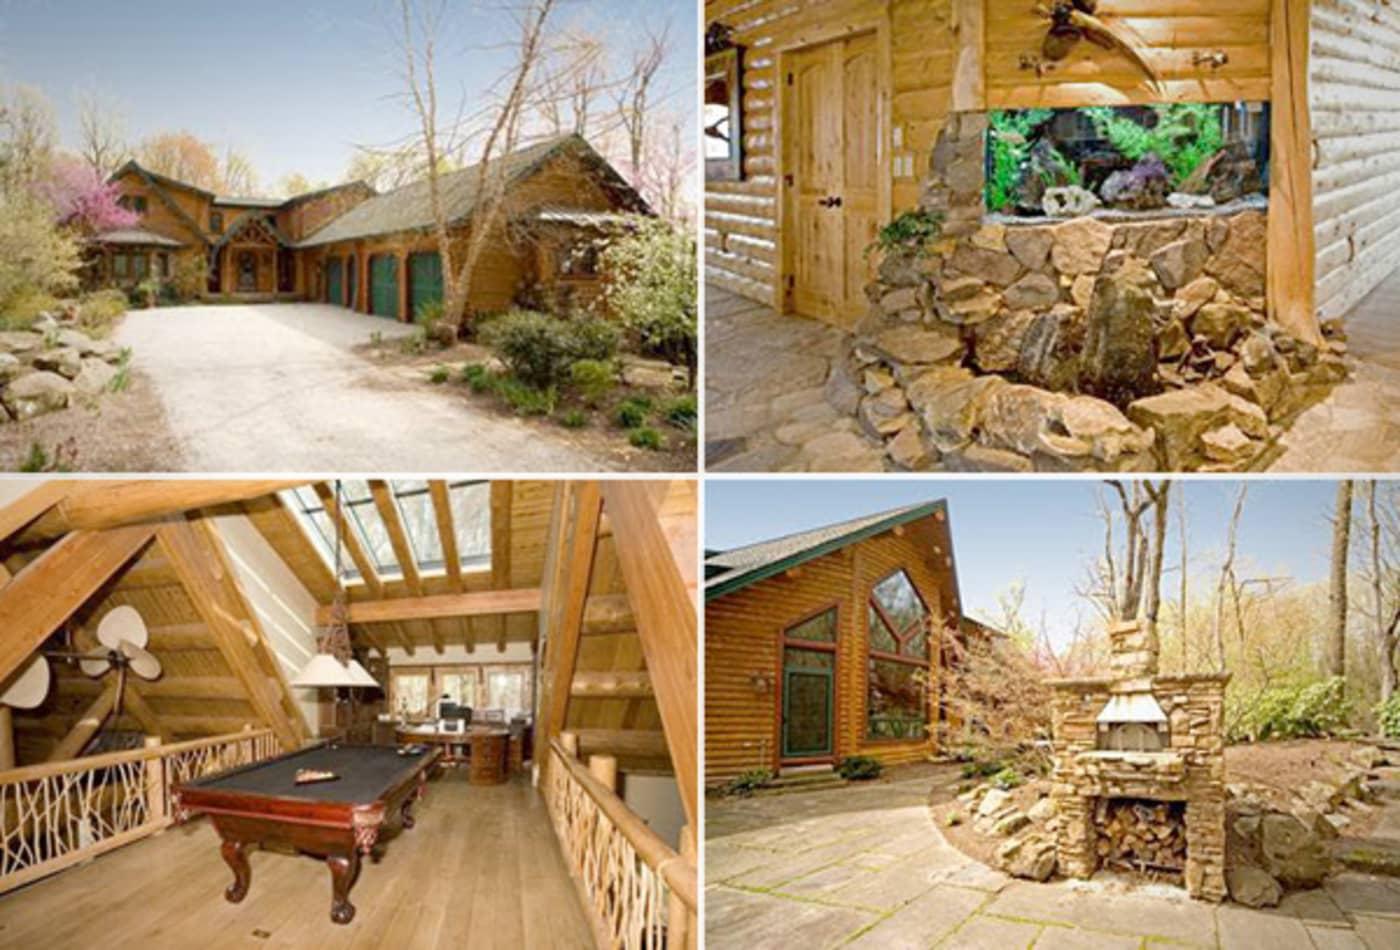 CNBC_luxurious_log_cabins_twinsburg.jpg